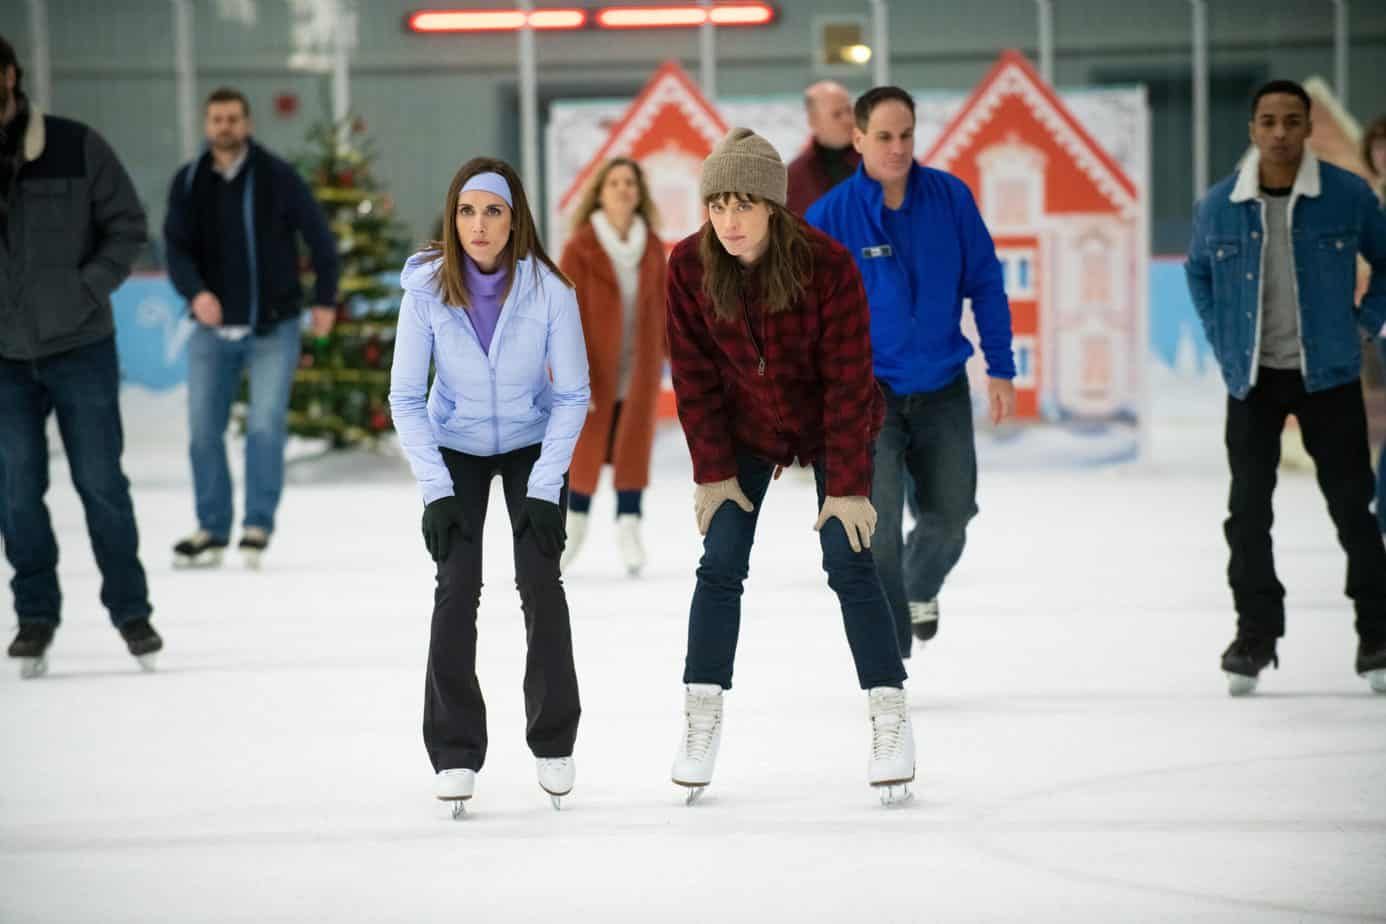 happiest season ice skating